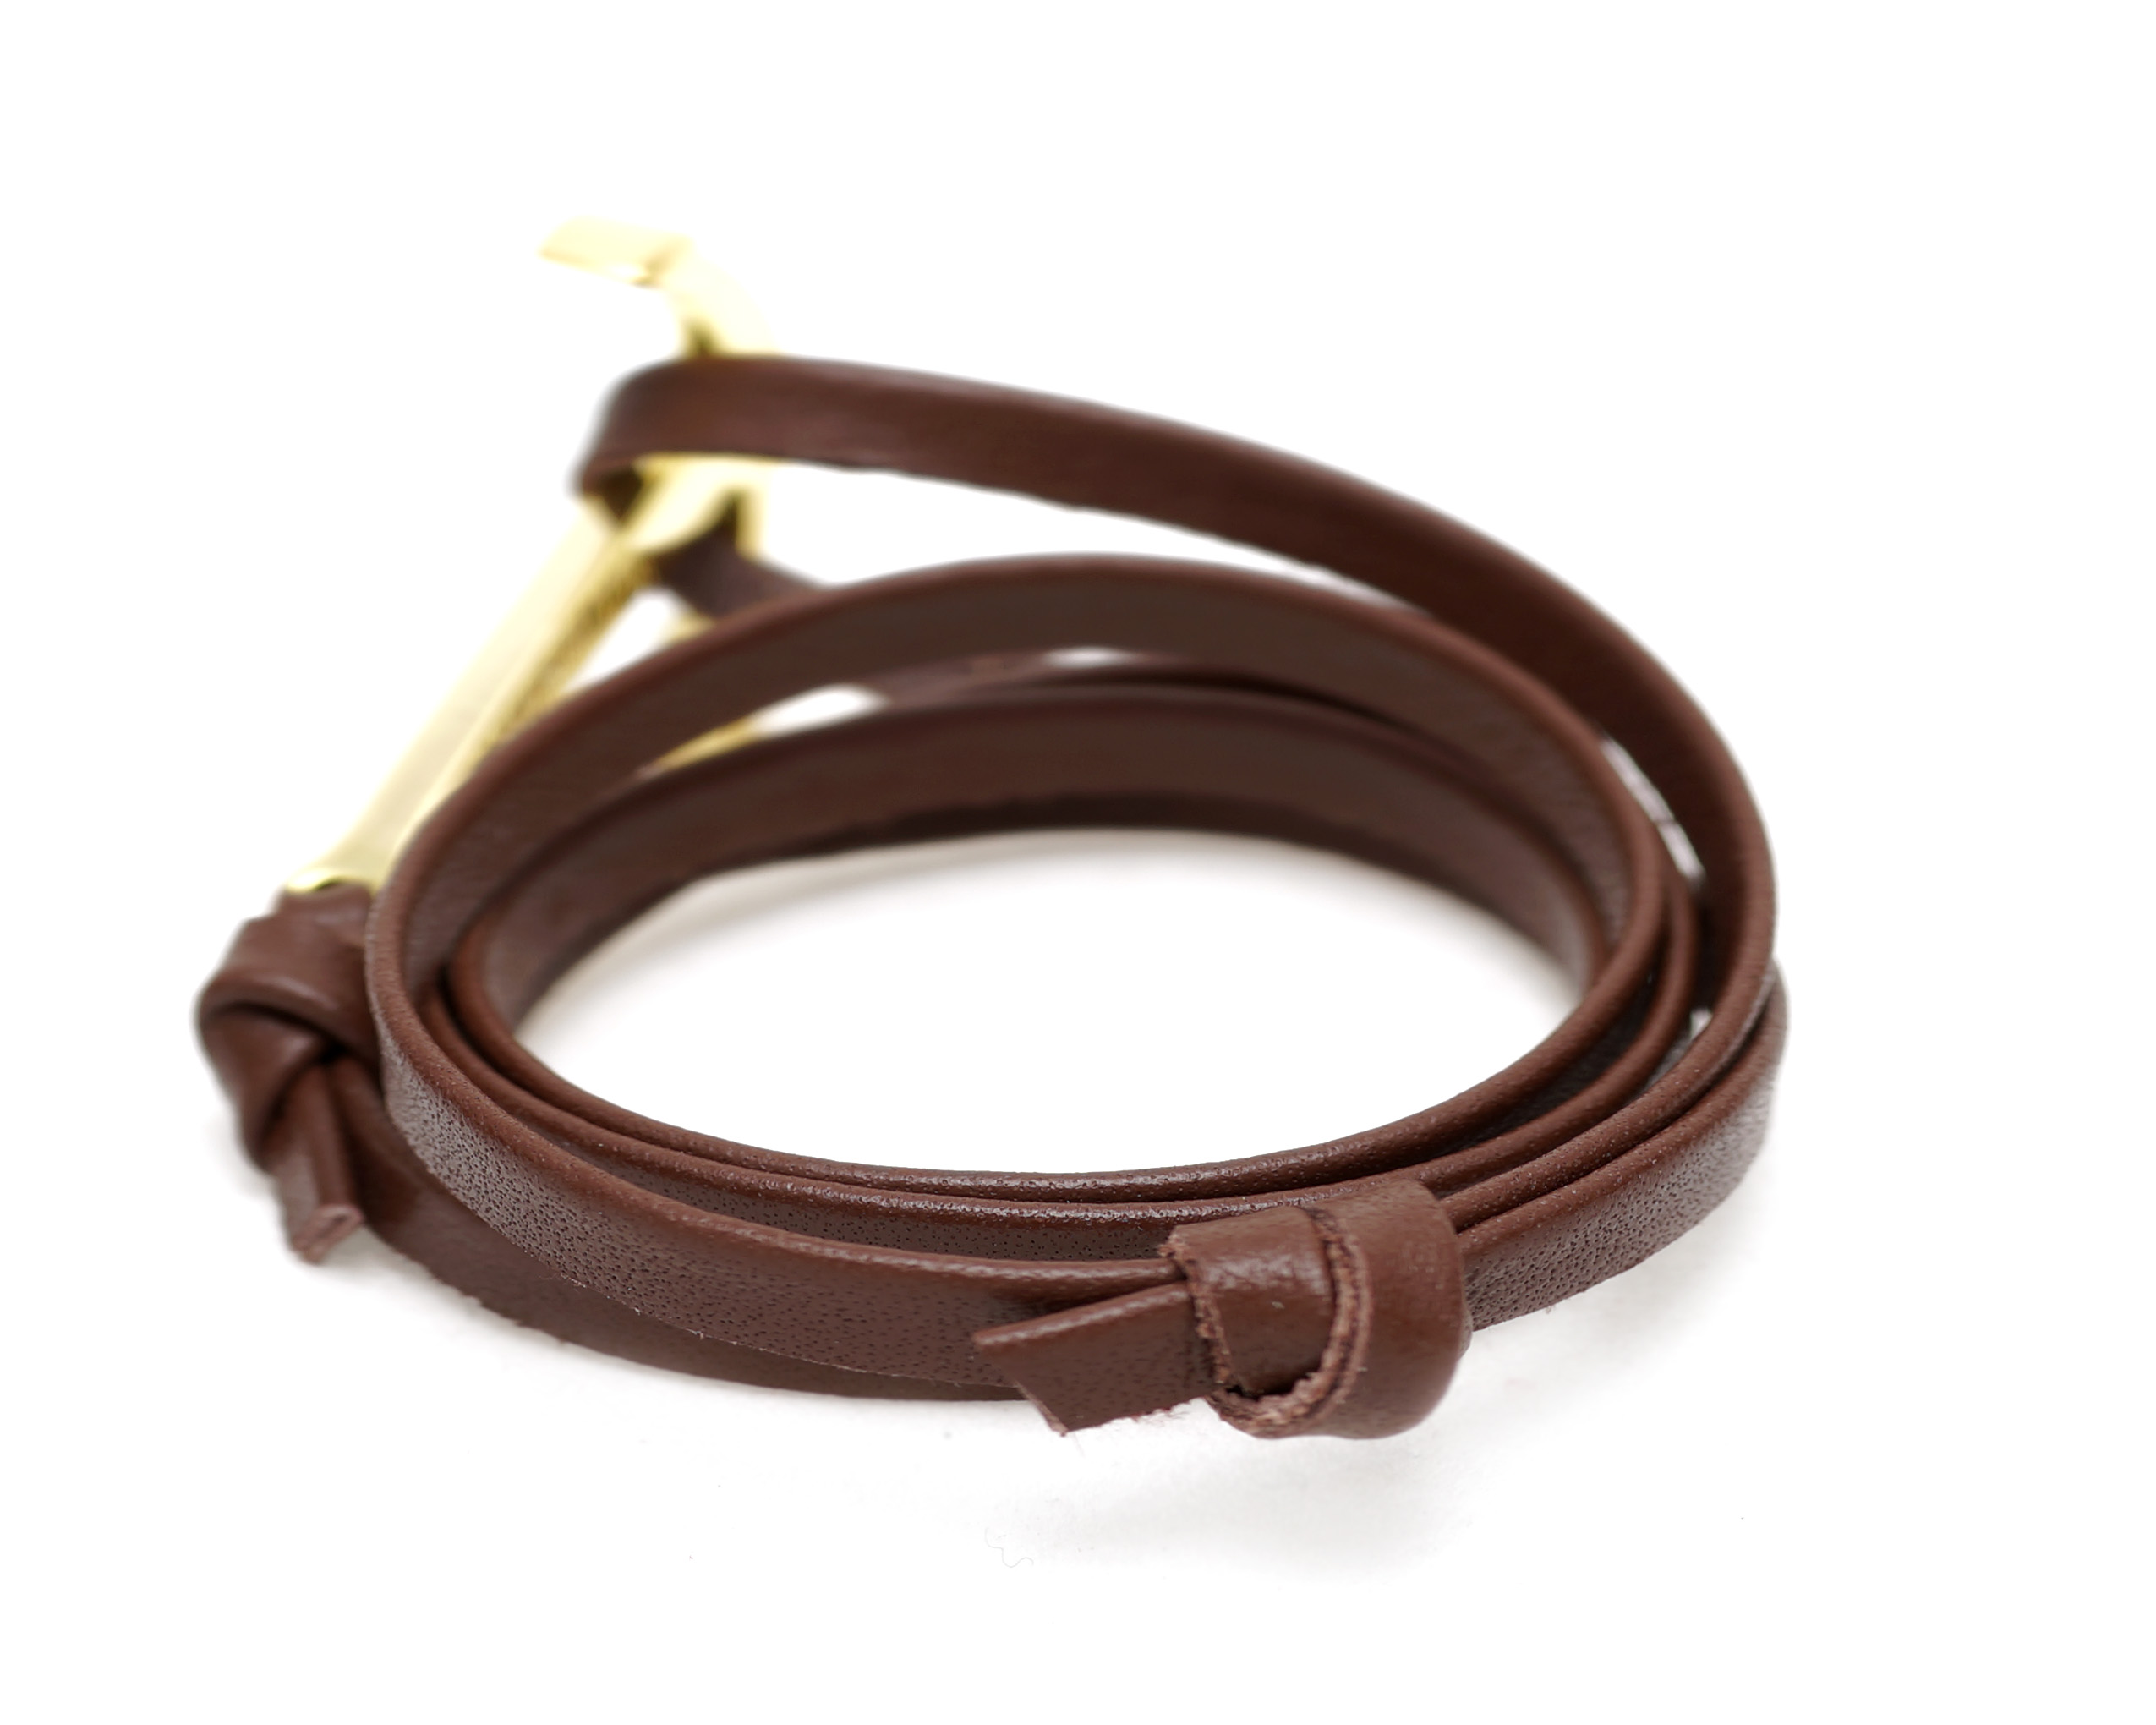 Leather Anchor Bracelets